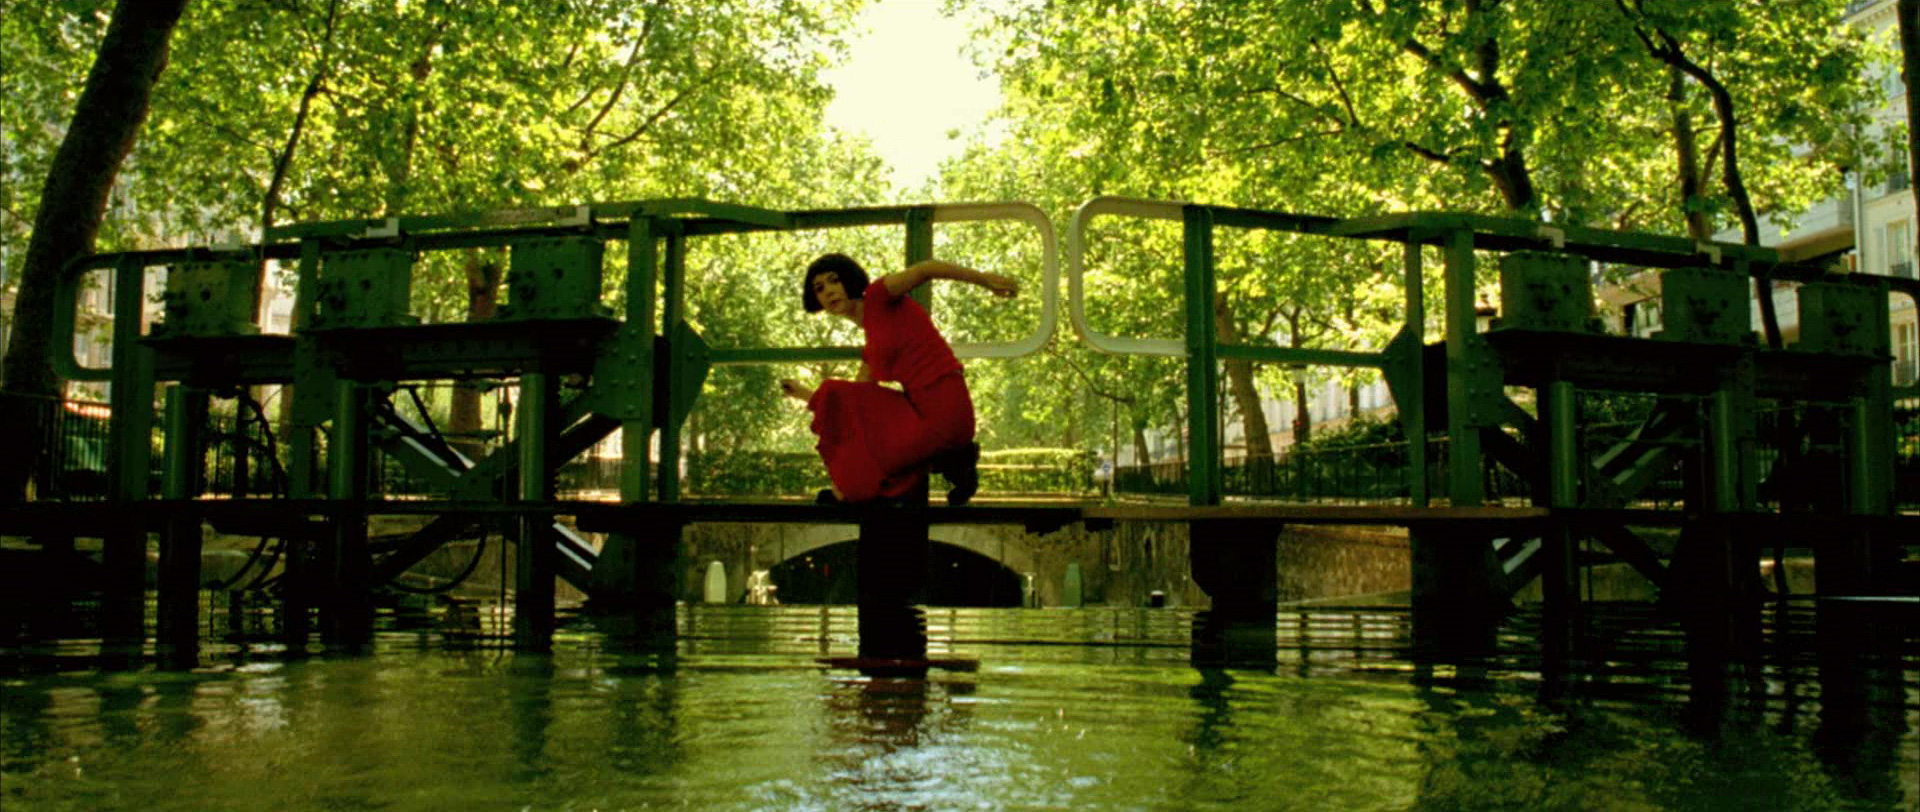 Amelie-10-screencapture-canal-saint-martin-paris.jpg